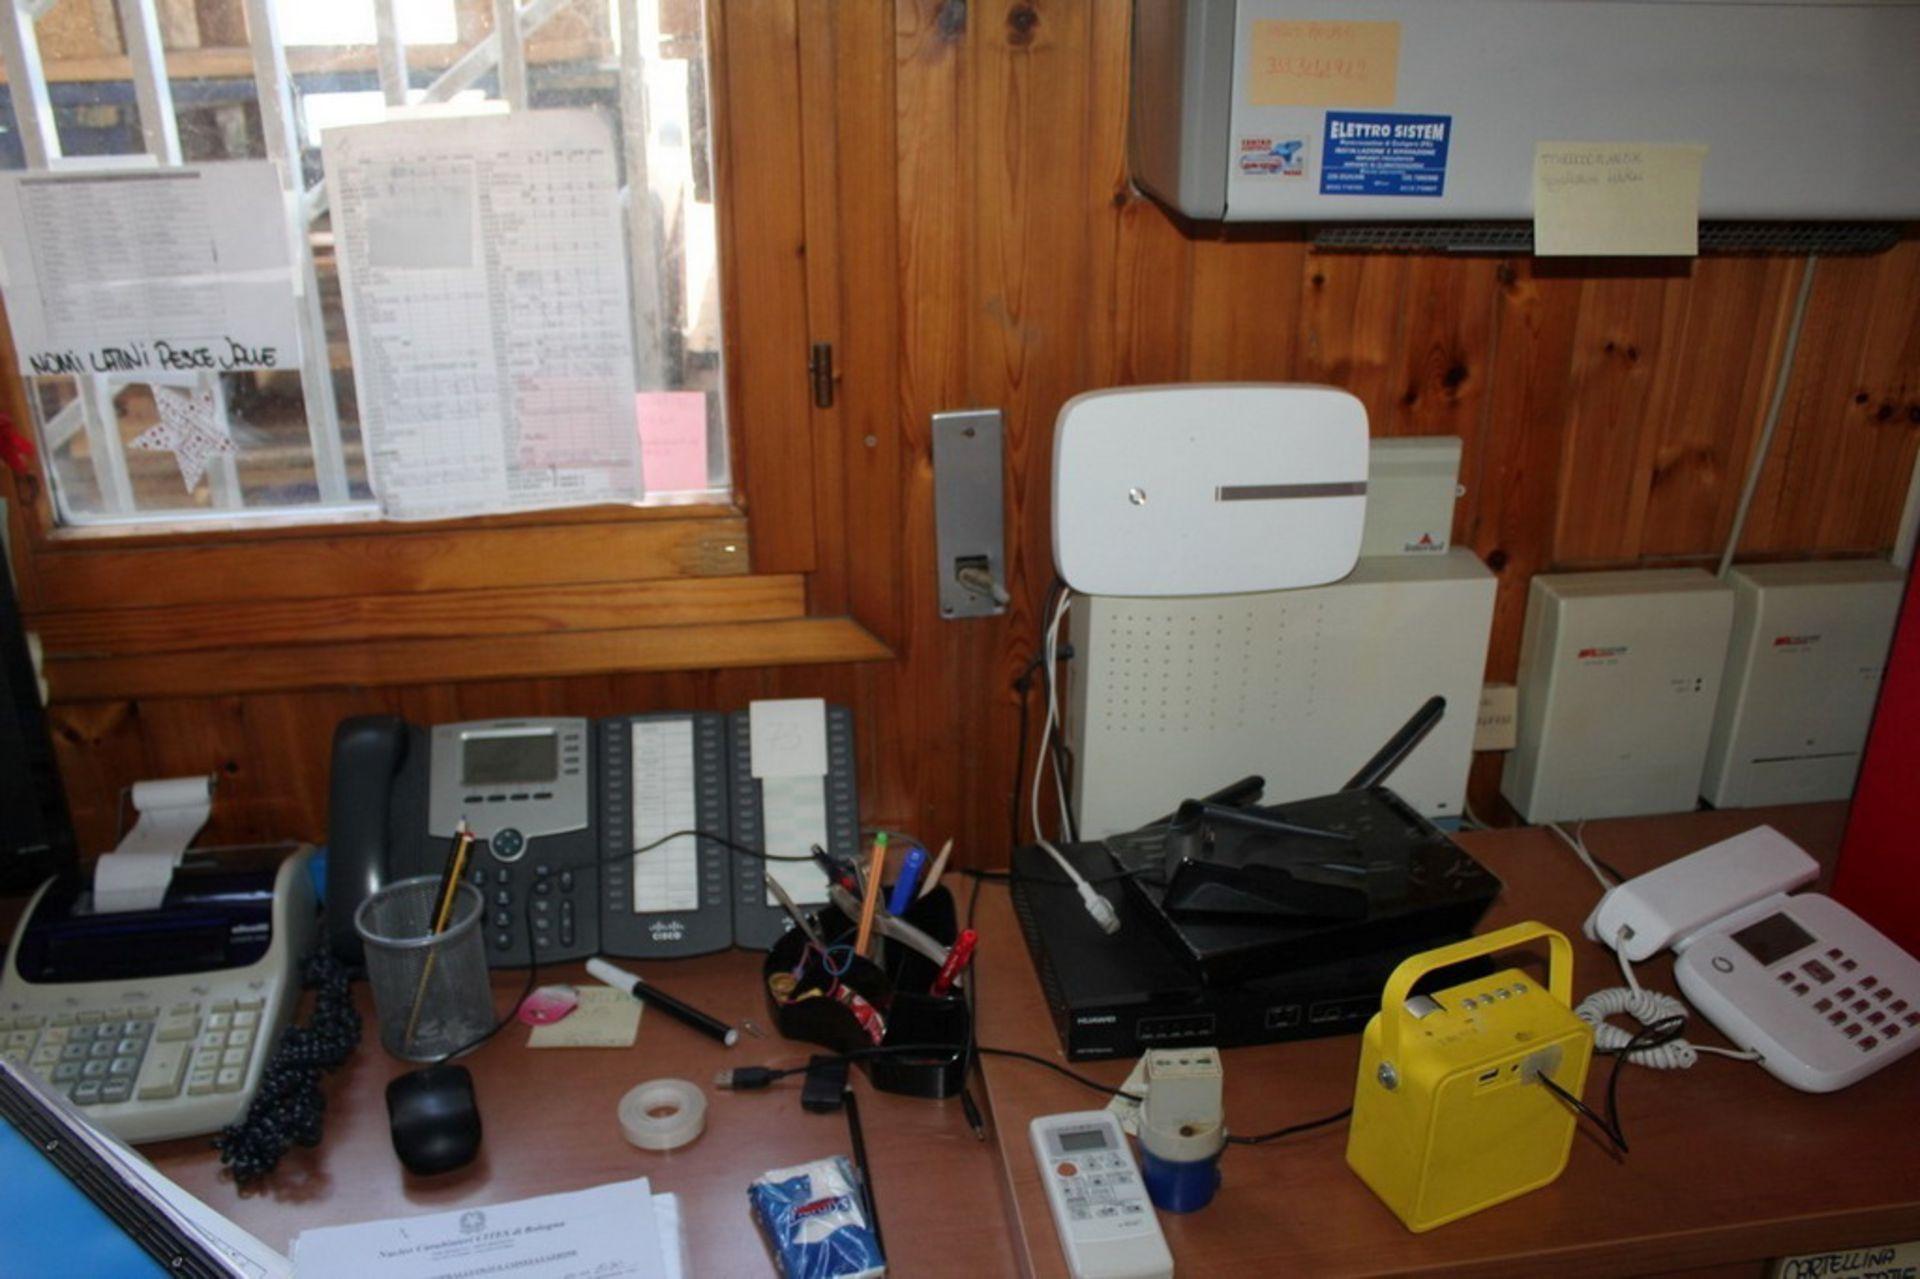 Lot 135 - N. 73 (716 IVG FALLIMENTO) IMPIANTO TELEFONICO CON TELEFONI SPARSI